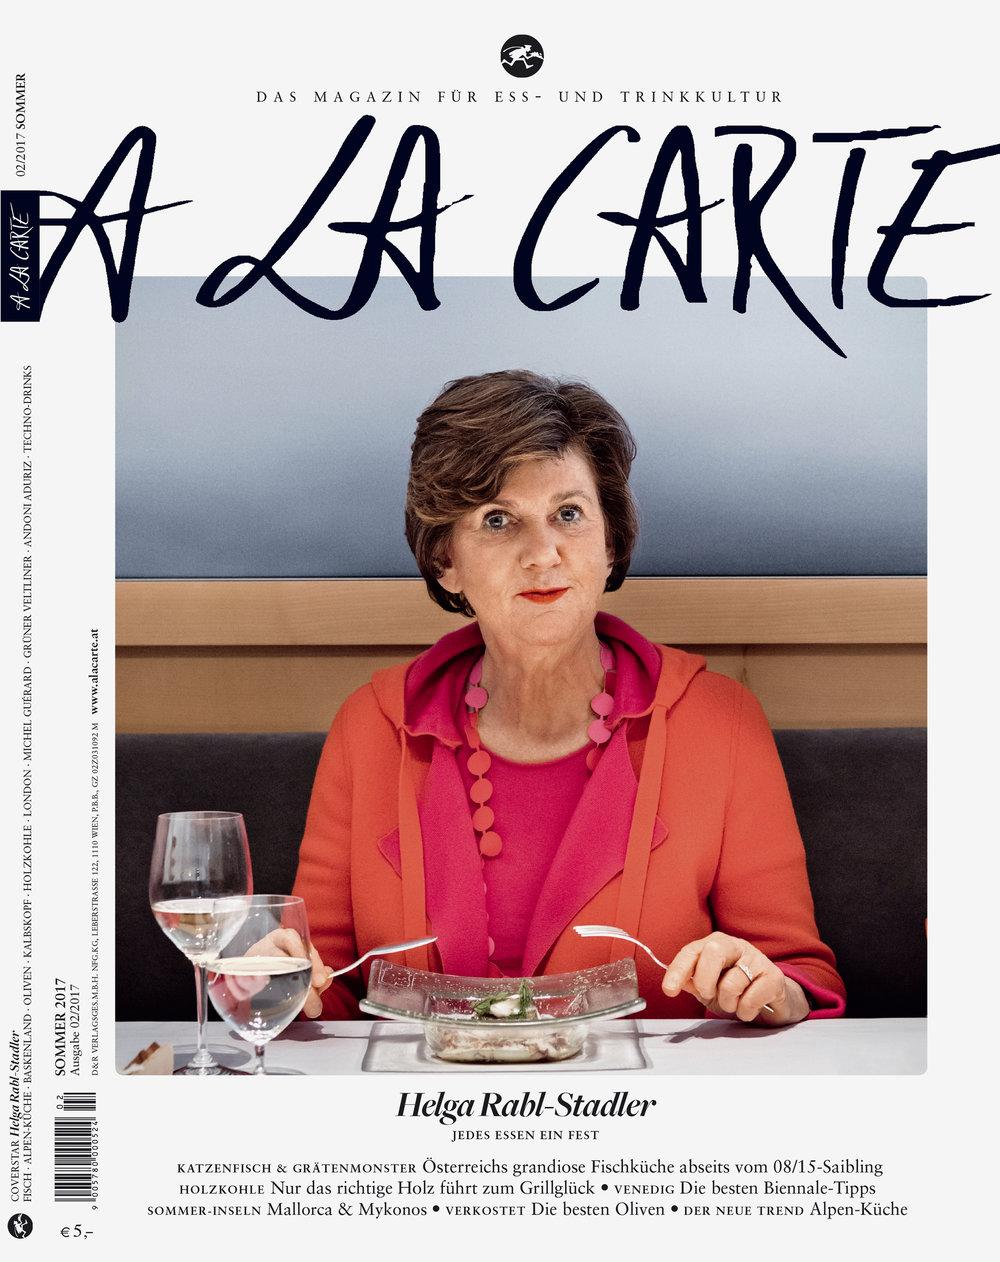 Coverstory mit Helga Rabl-Stadler